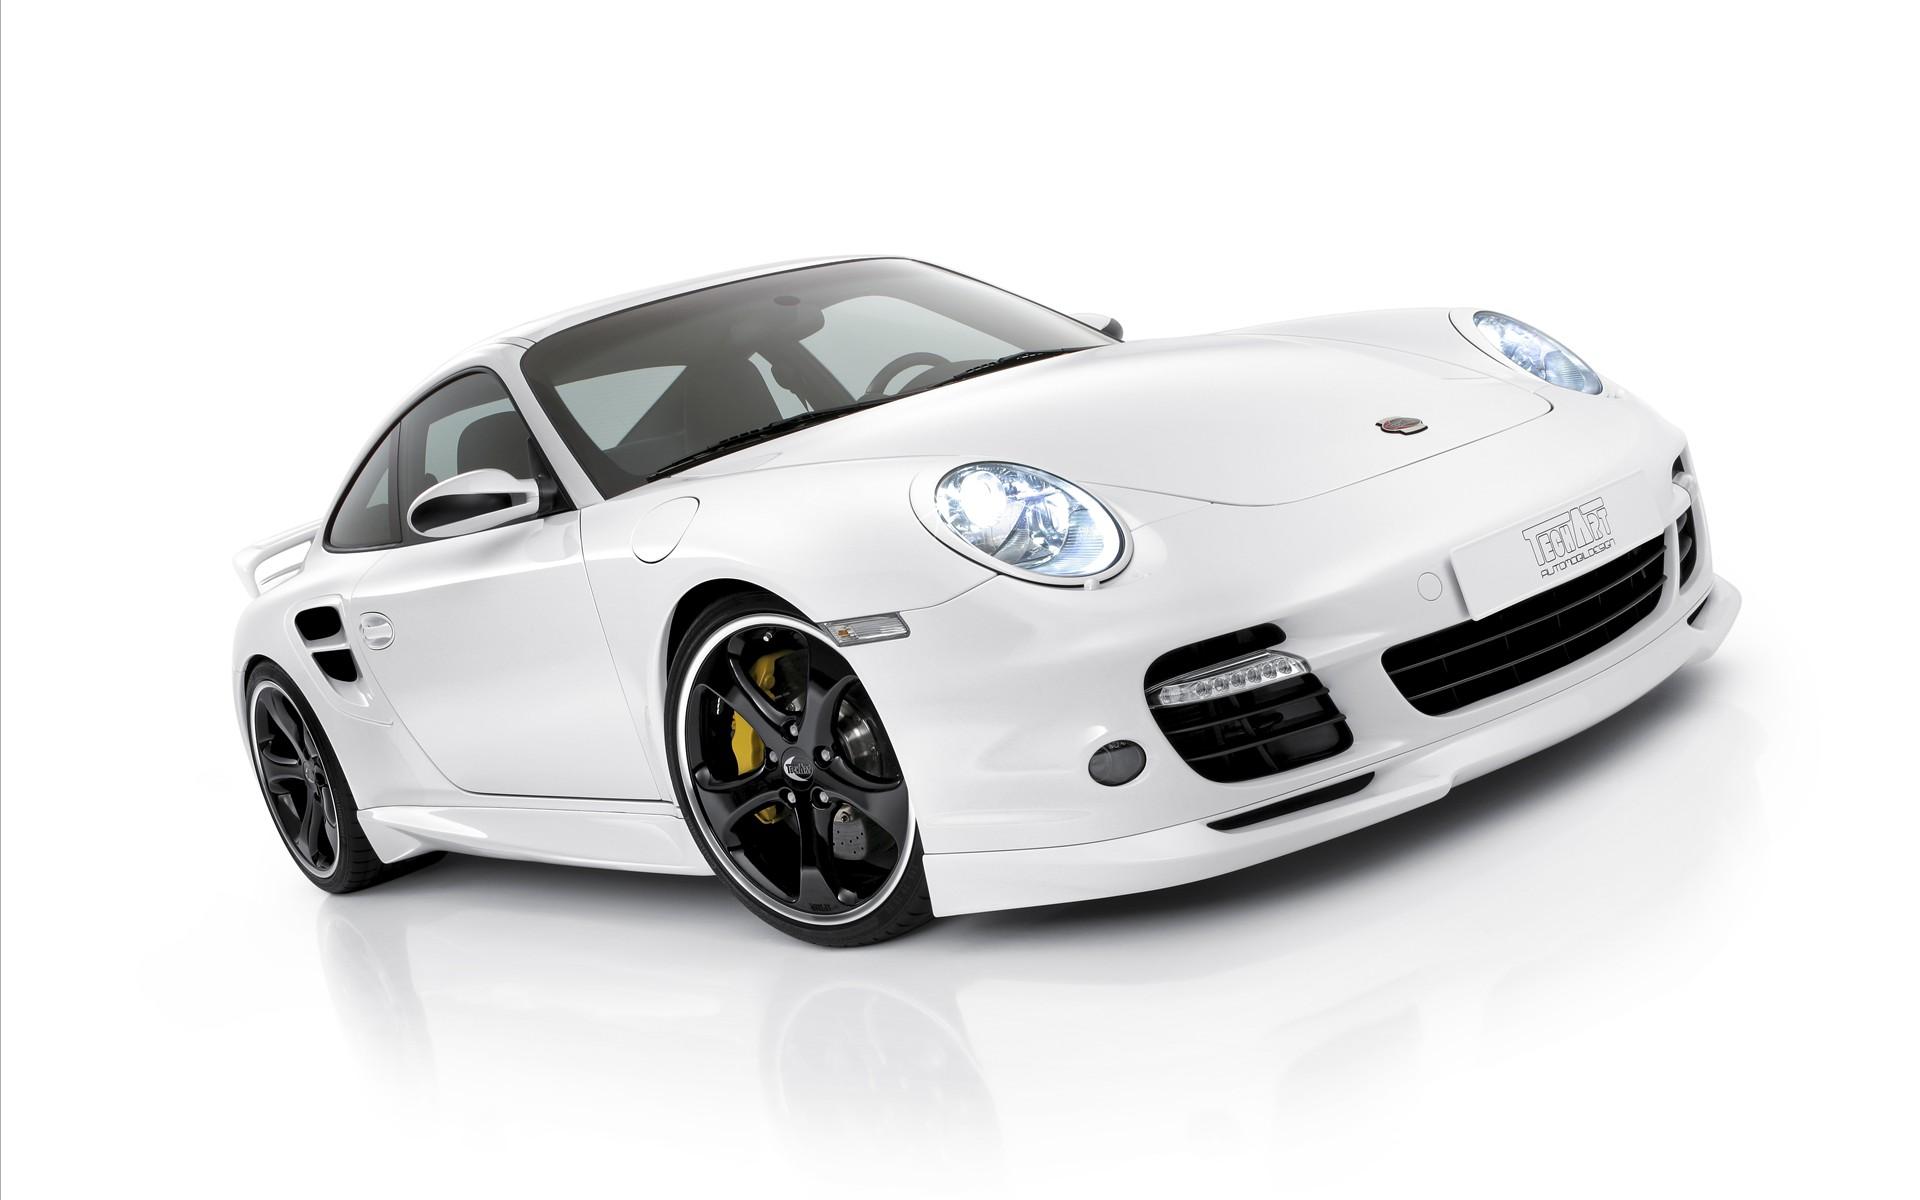 Porsche techart design white wallpaper hd car wallpapers - Car wallpaper black and white ...